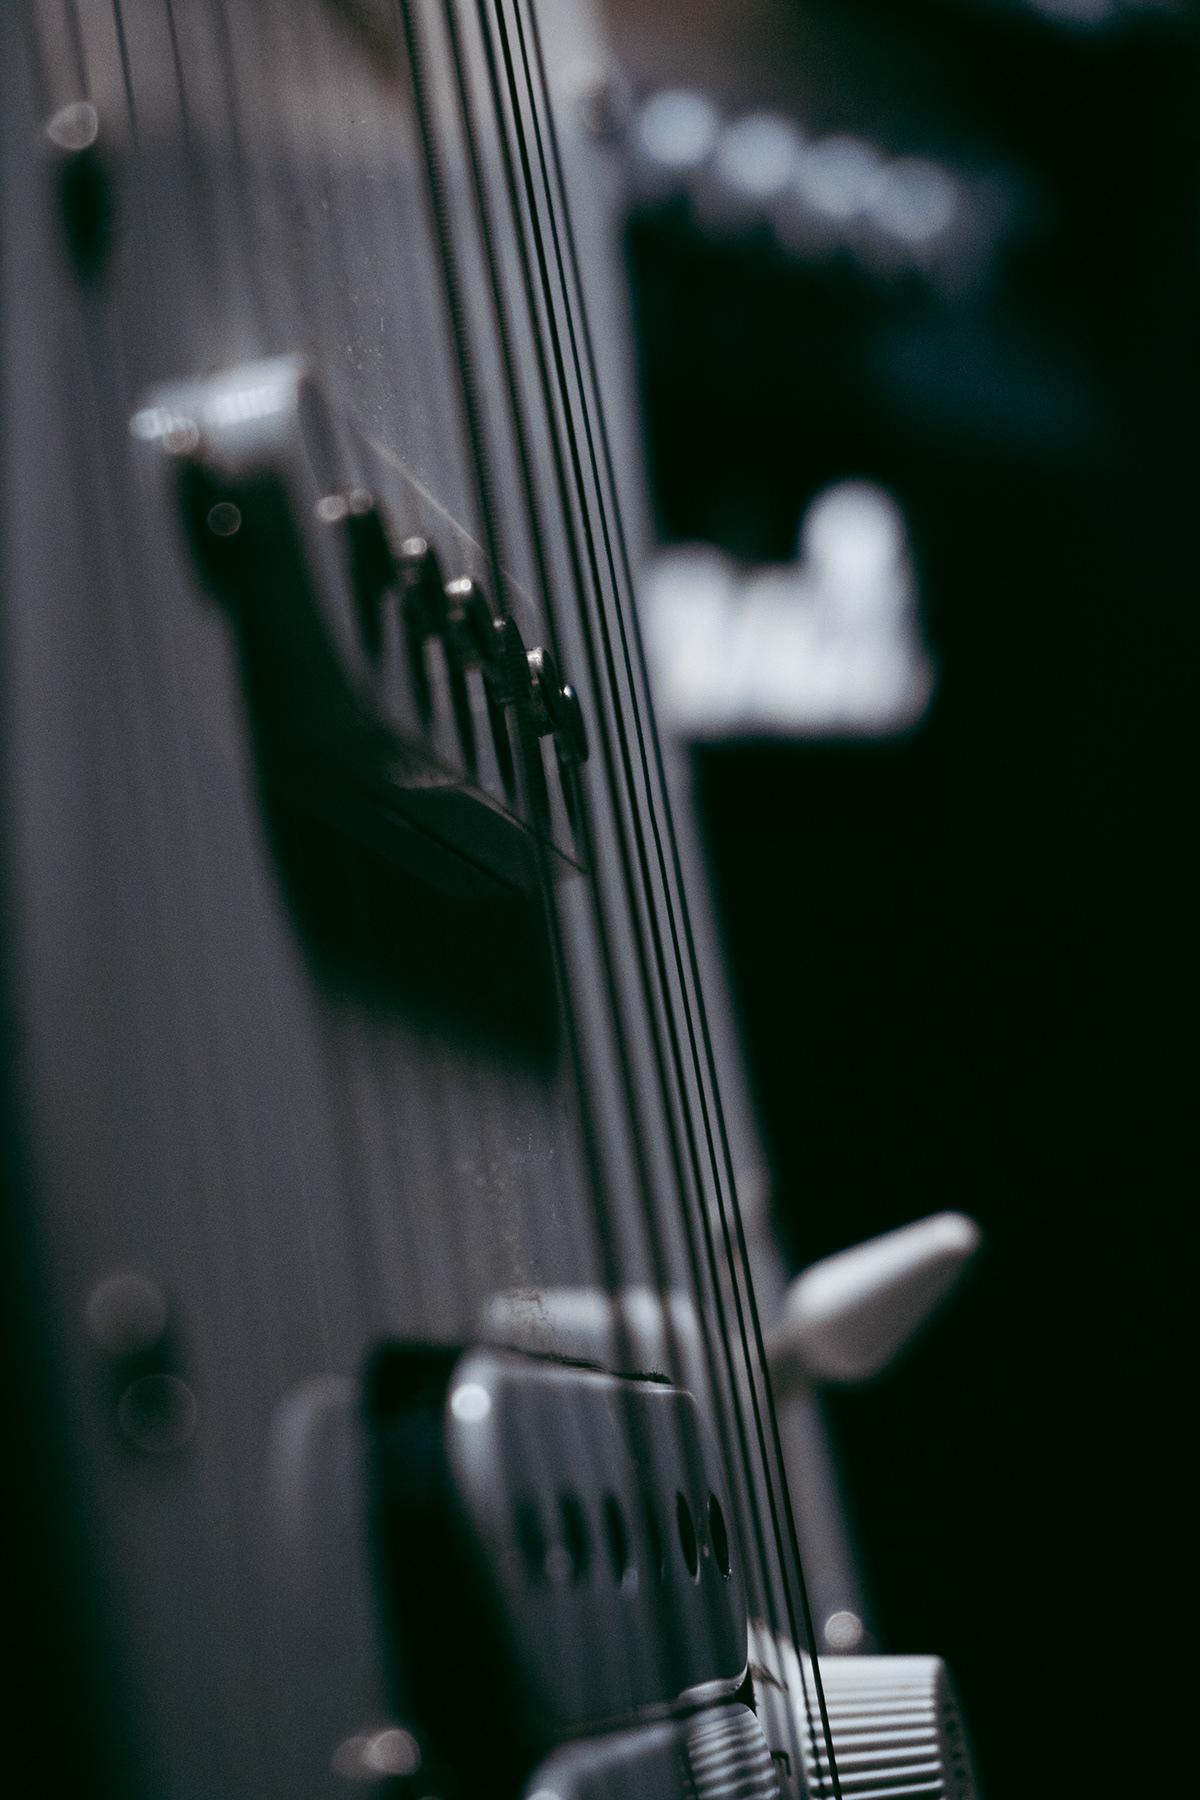 guitarphotoshoot musicphotography productphotography ProductPhotoshoot